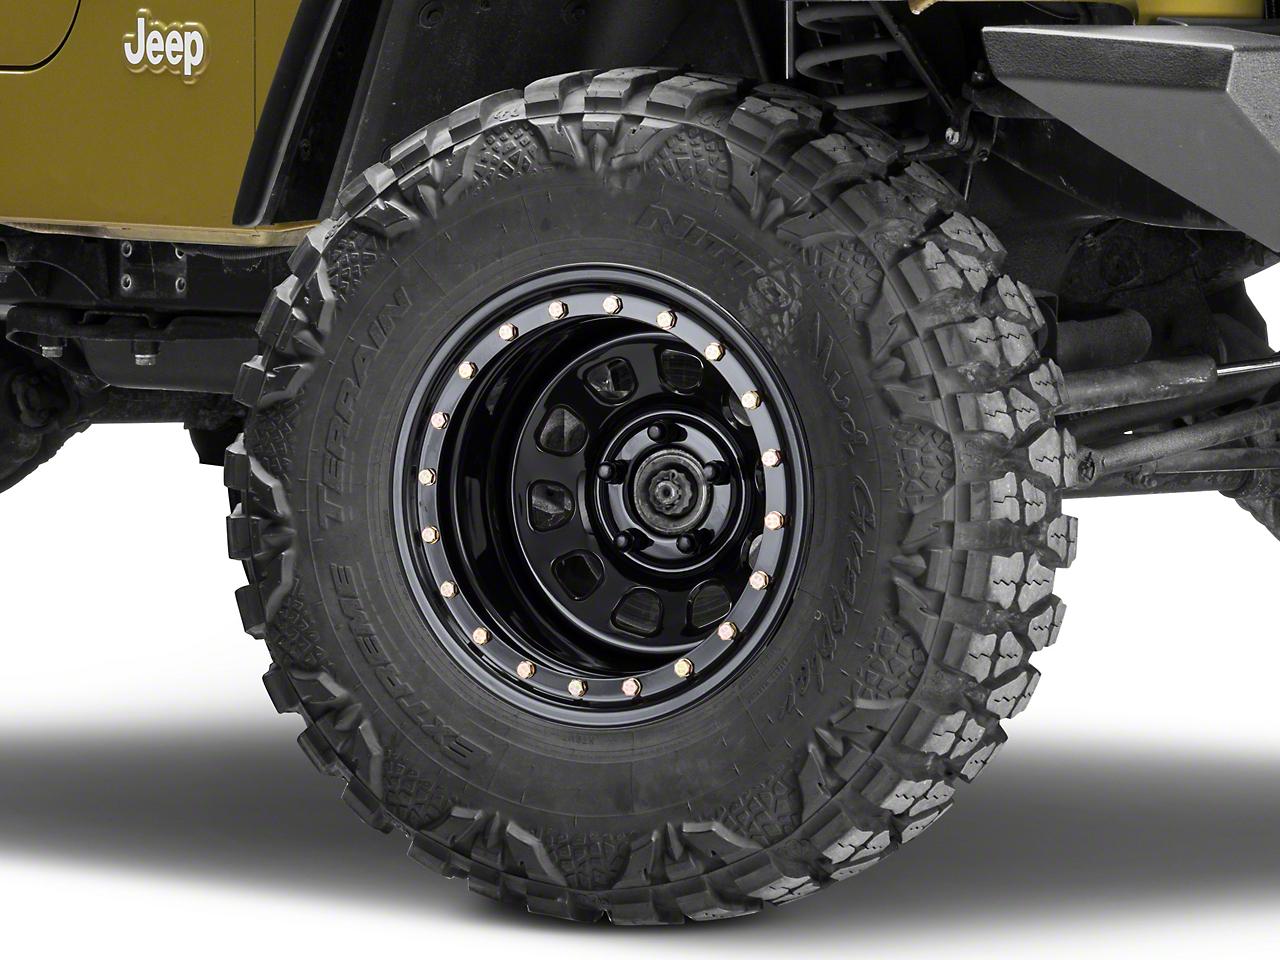 Pro Comp Steel Series 252 Street Lock Gloss Black Wheel - 15x10 (87-06 Wrangler YJ & TJ)